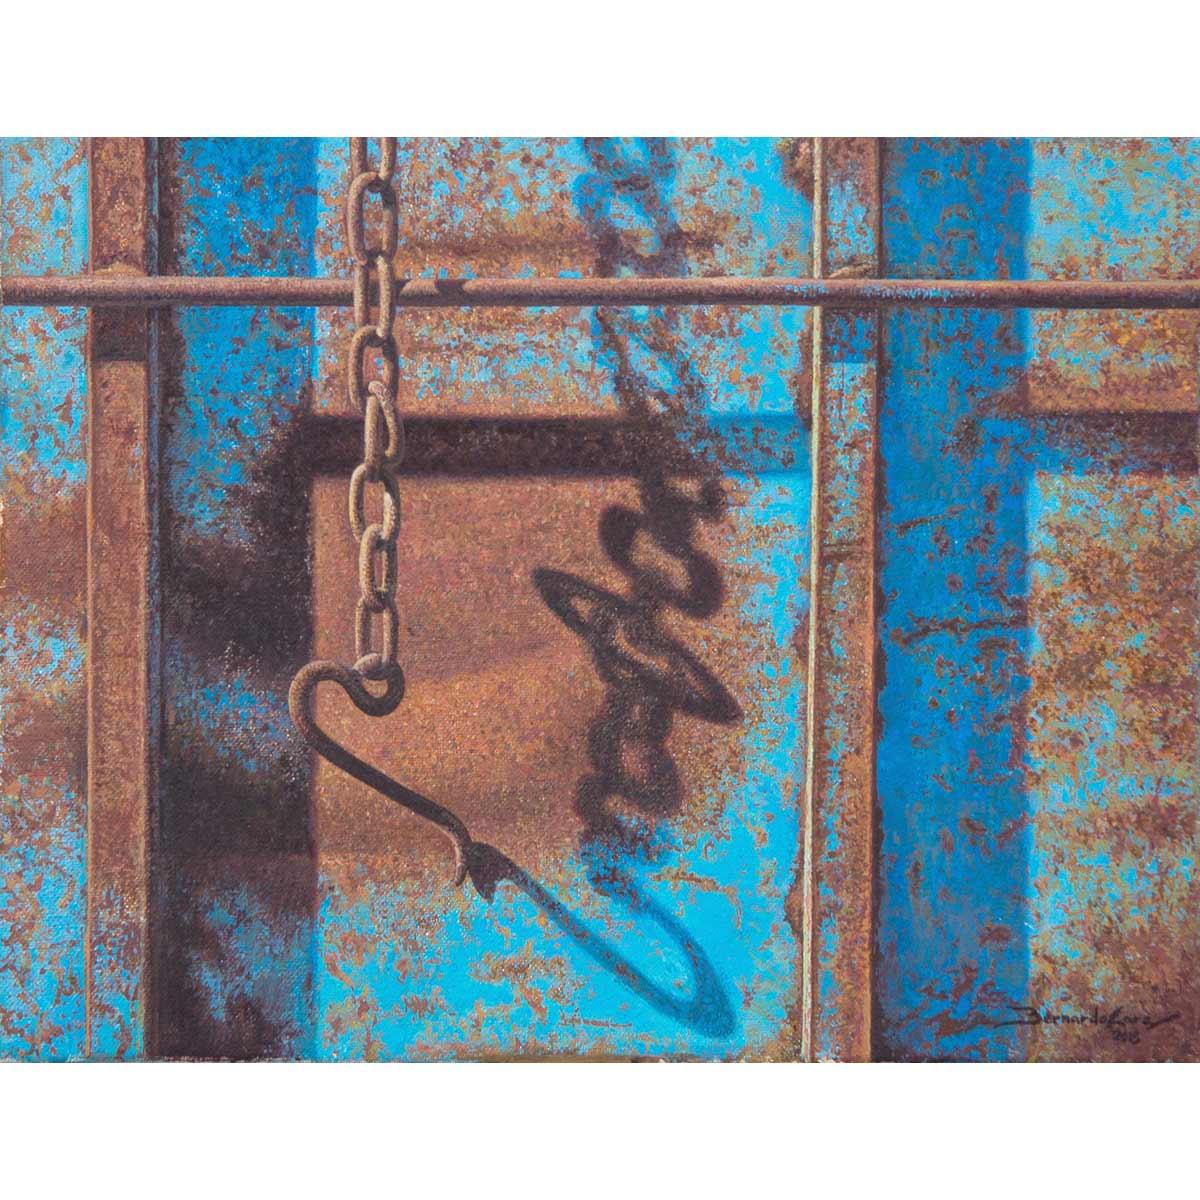 BERNARDO LARA - El gancho. Óleo sobre lienzo. 65x54cm.